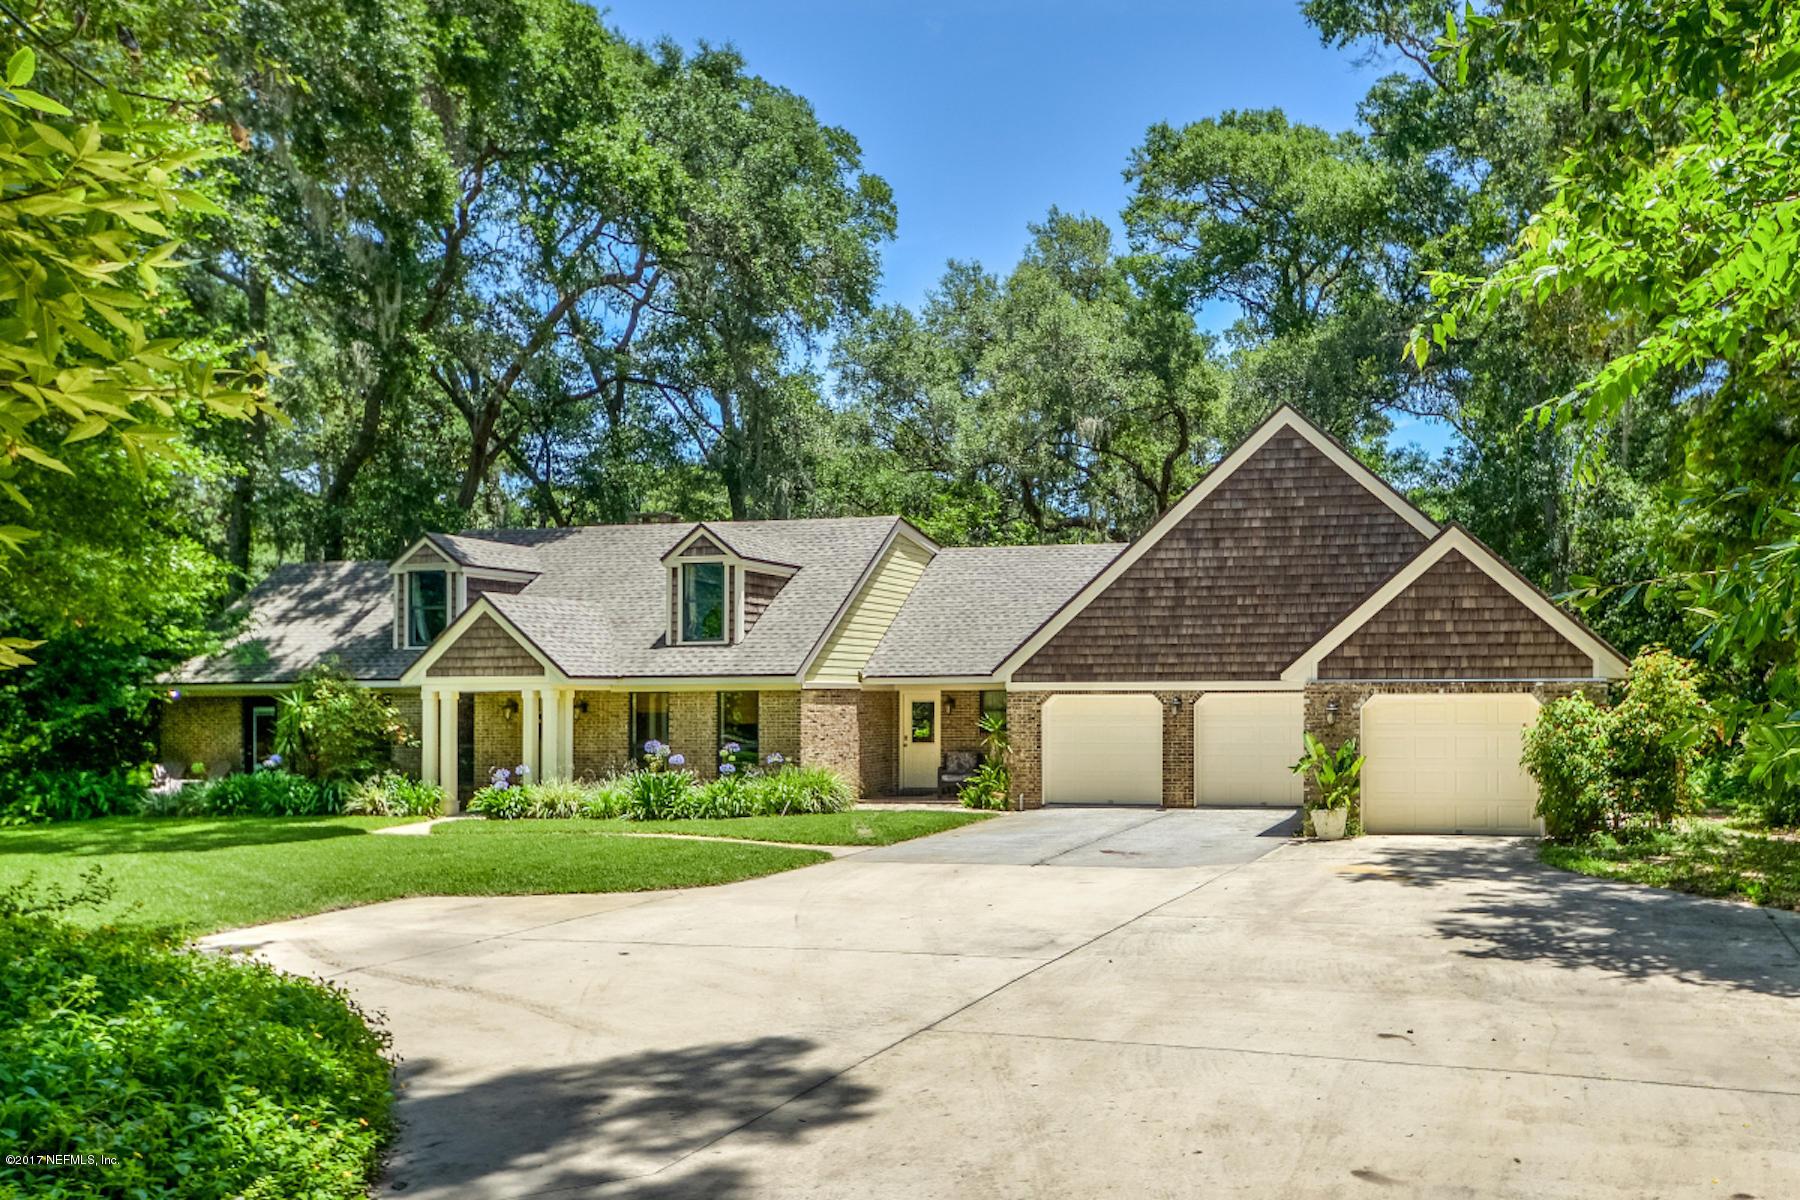 1304 MARIAN, FERNANDINA BEACH, FLORIDA 32034, 5 Bedrooms Bedrooms, ,3 BathroomsBathrooms,Residential - single family,For sale,MARIAN,893509